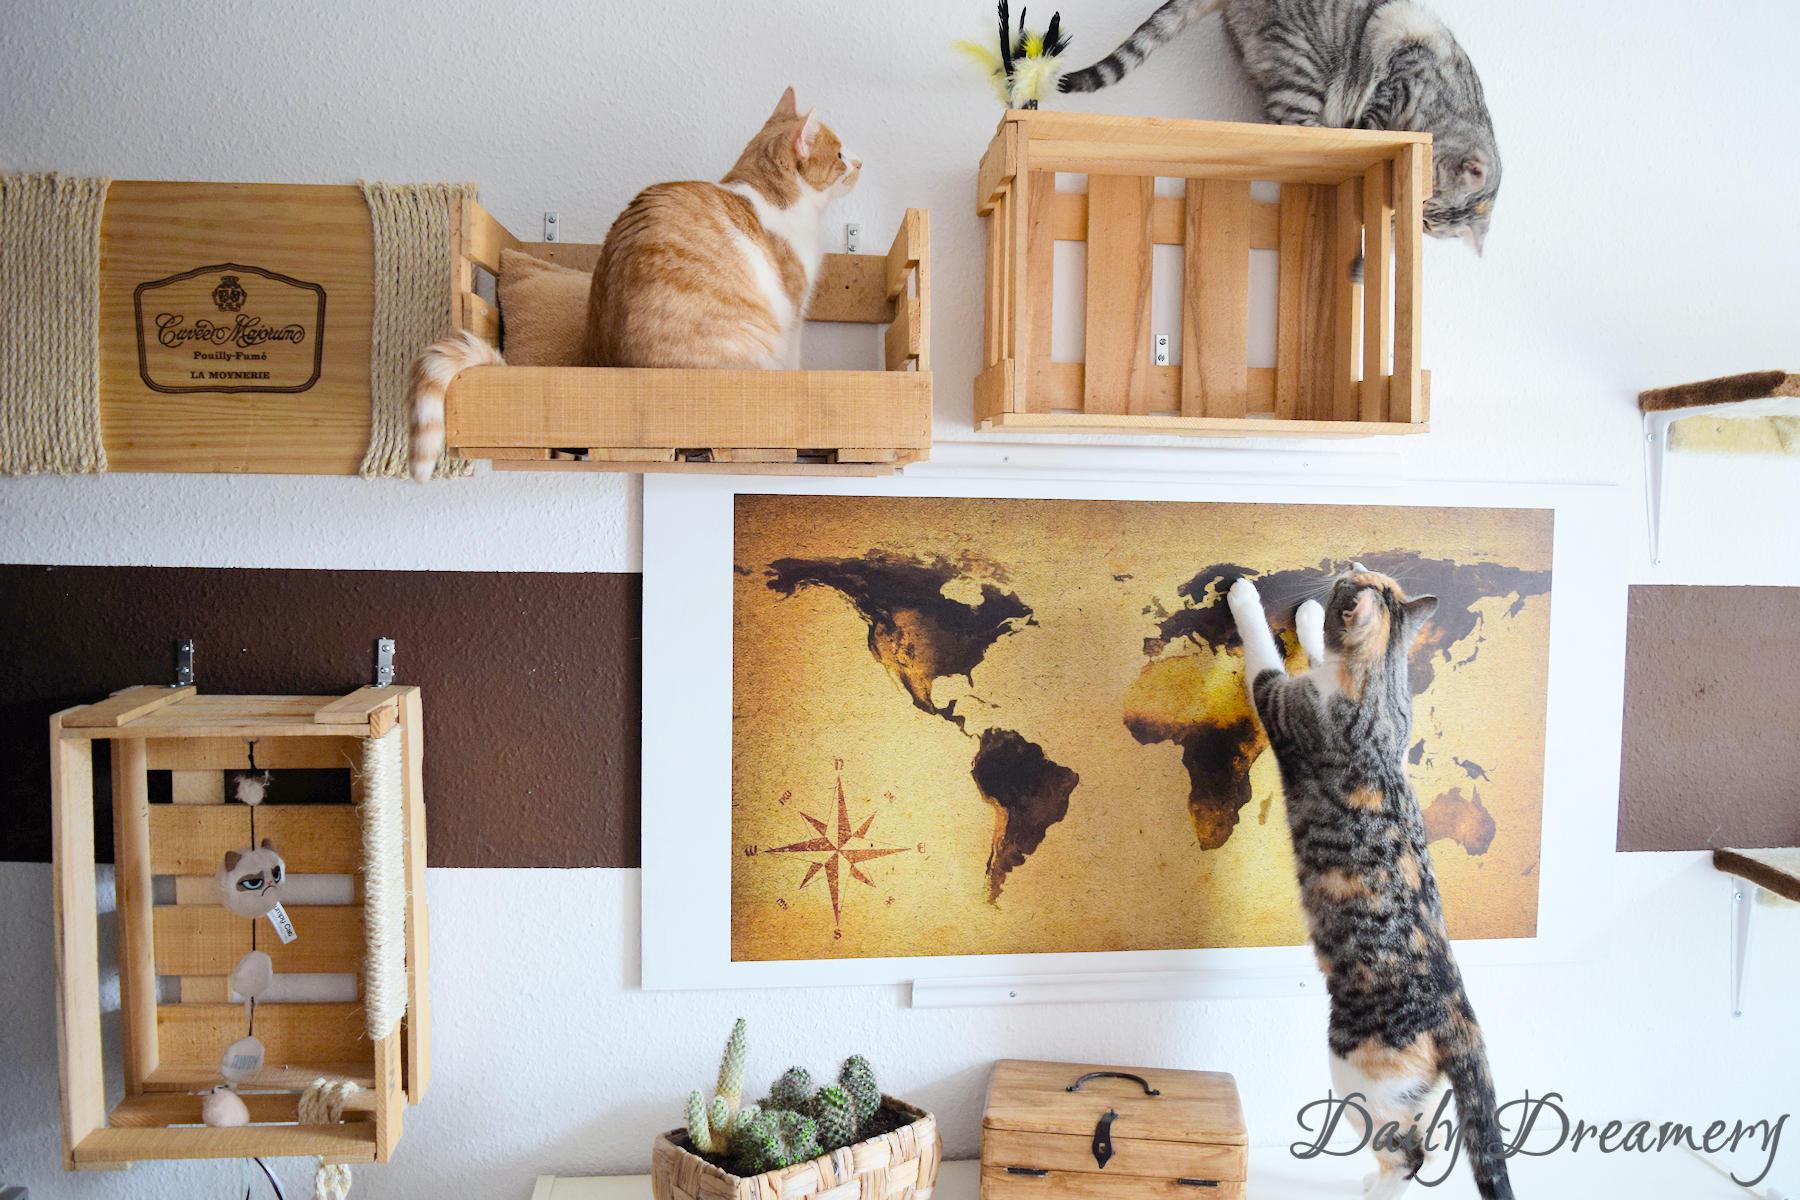 Turbo DIY-Katzenspielzeug-Kletterwand-Wohnungskatzen-Purina-12 – Daily DP98